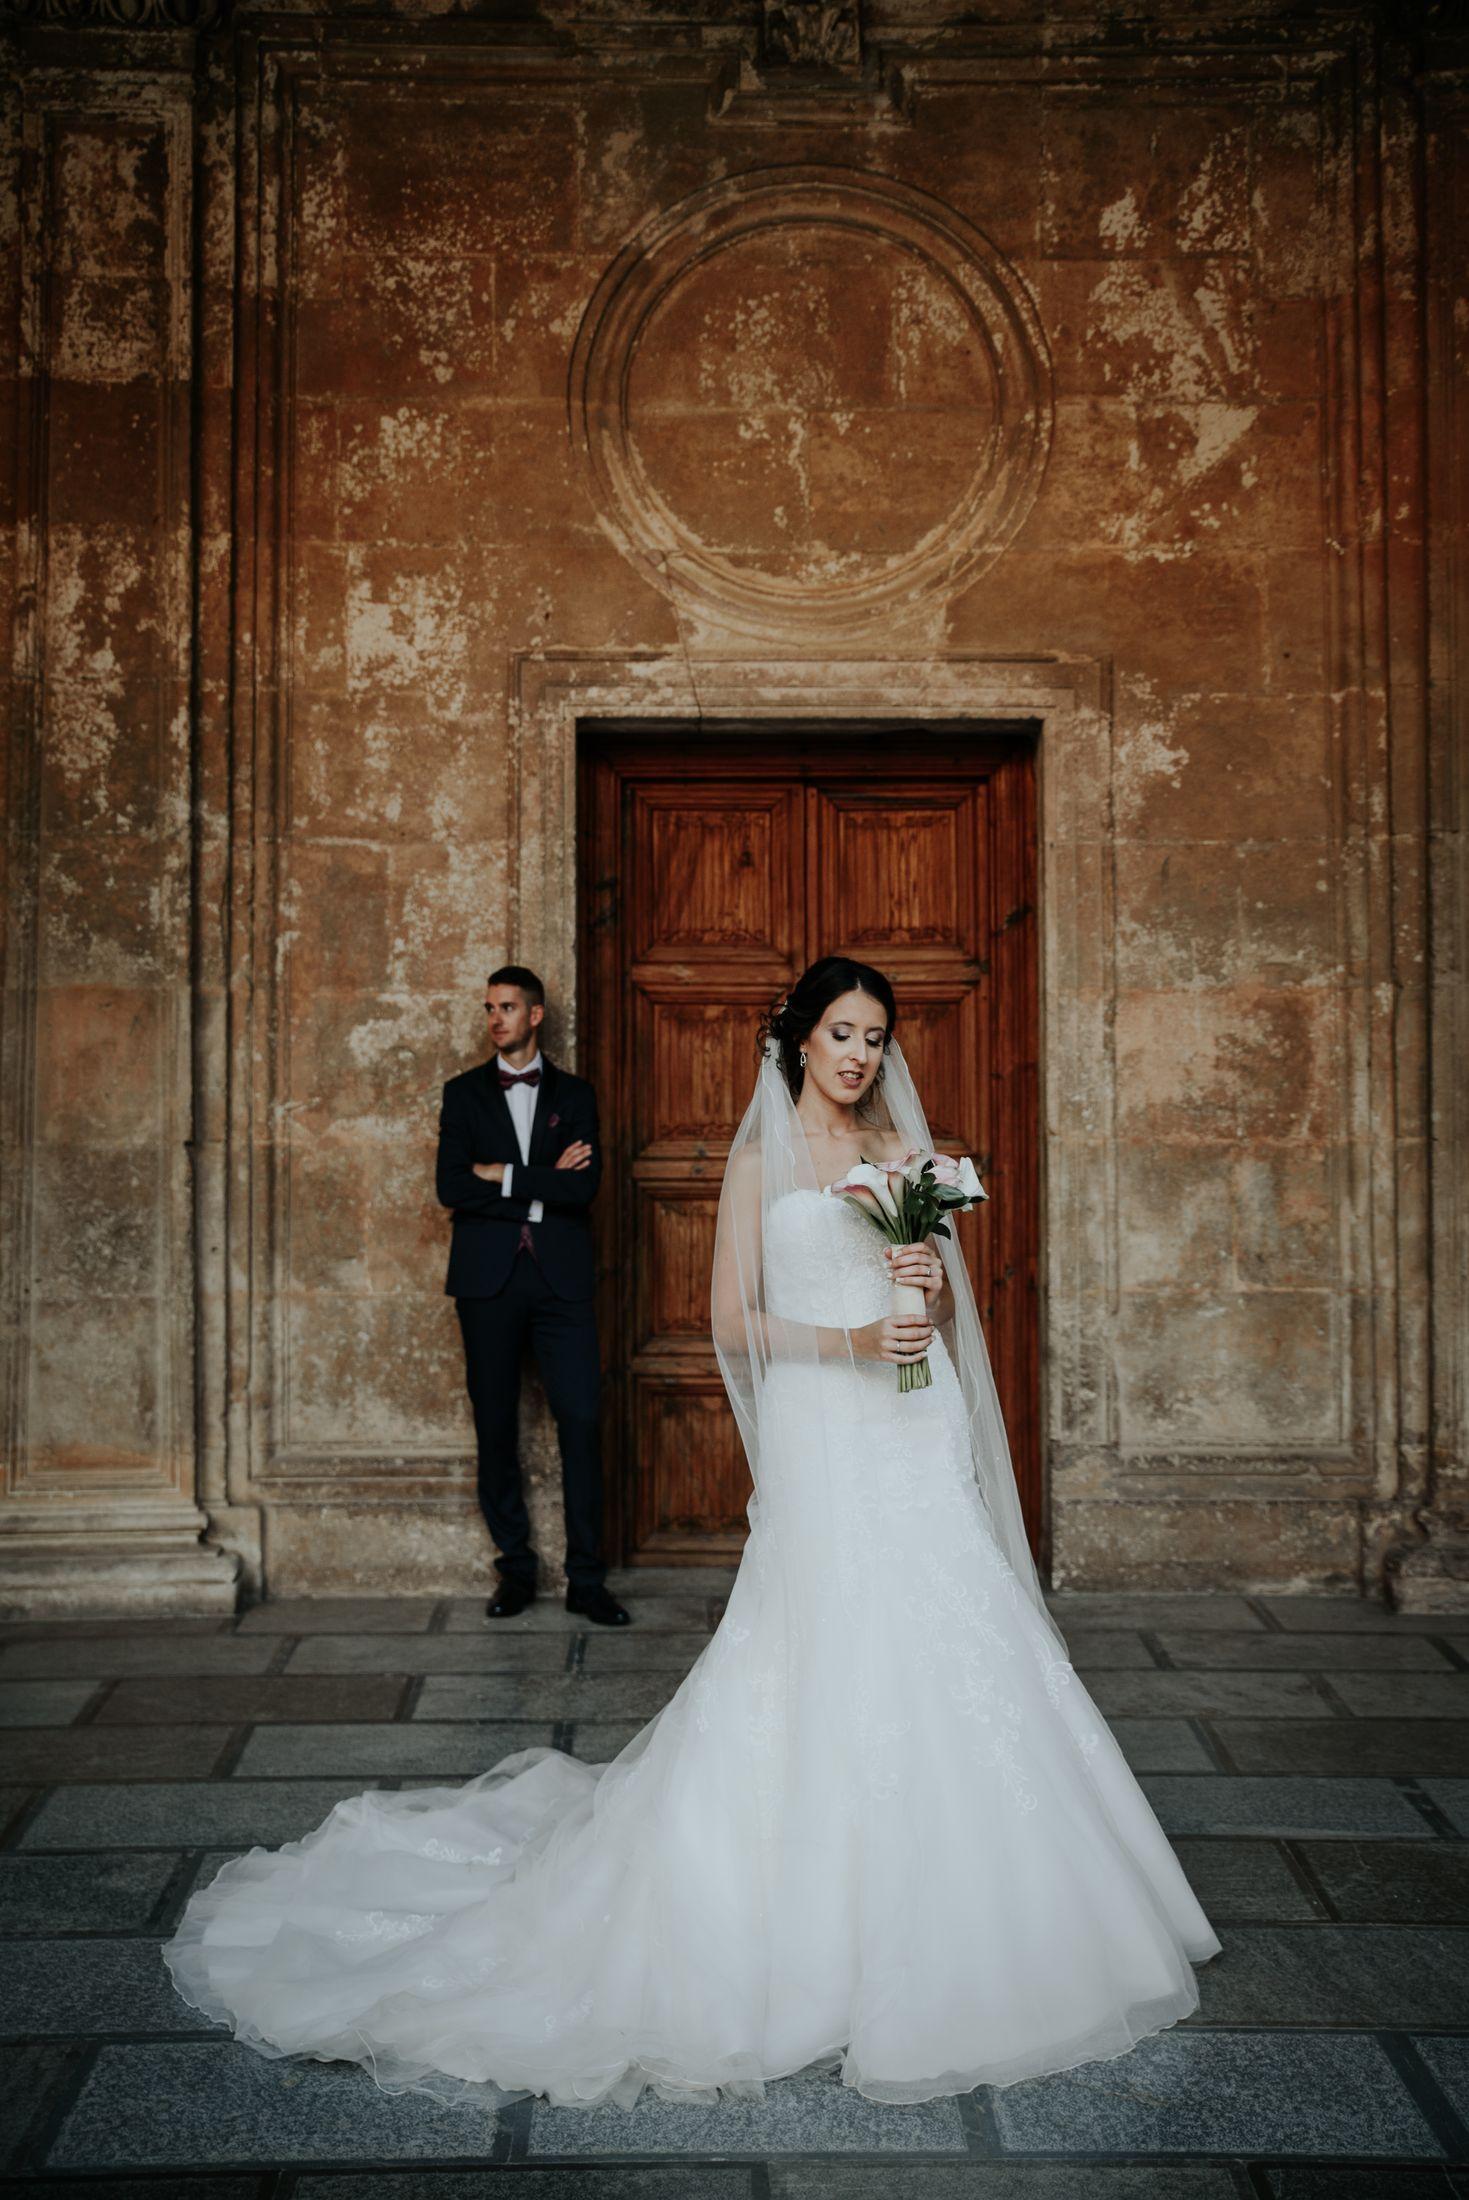 Fotografo de bodas en Alhambra